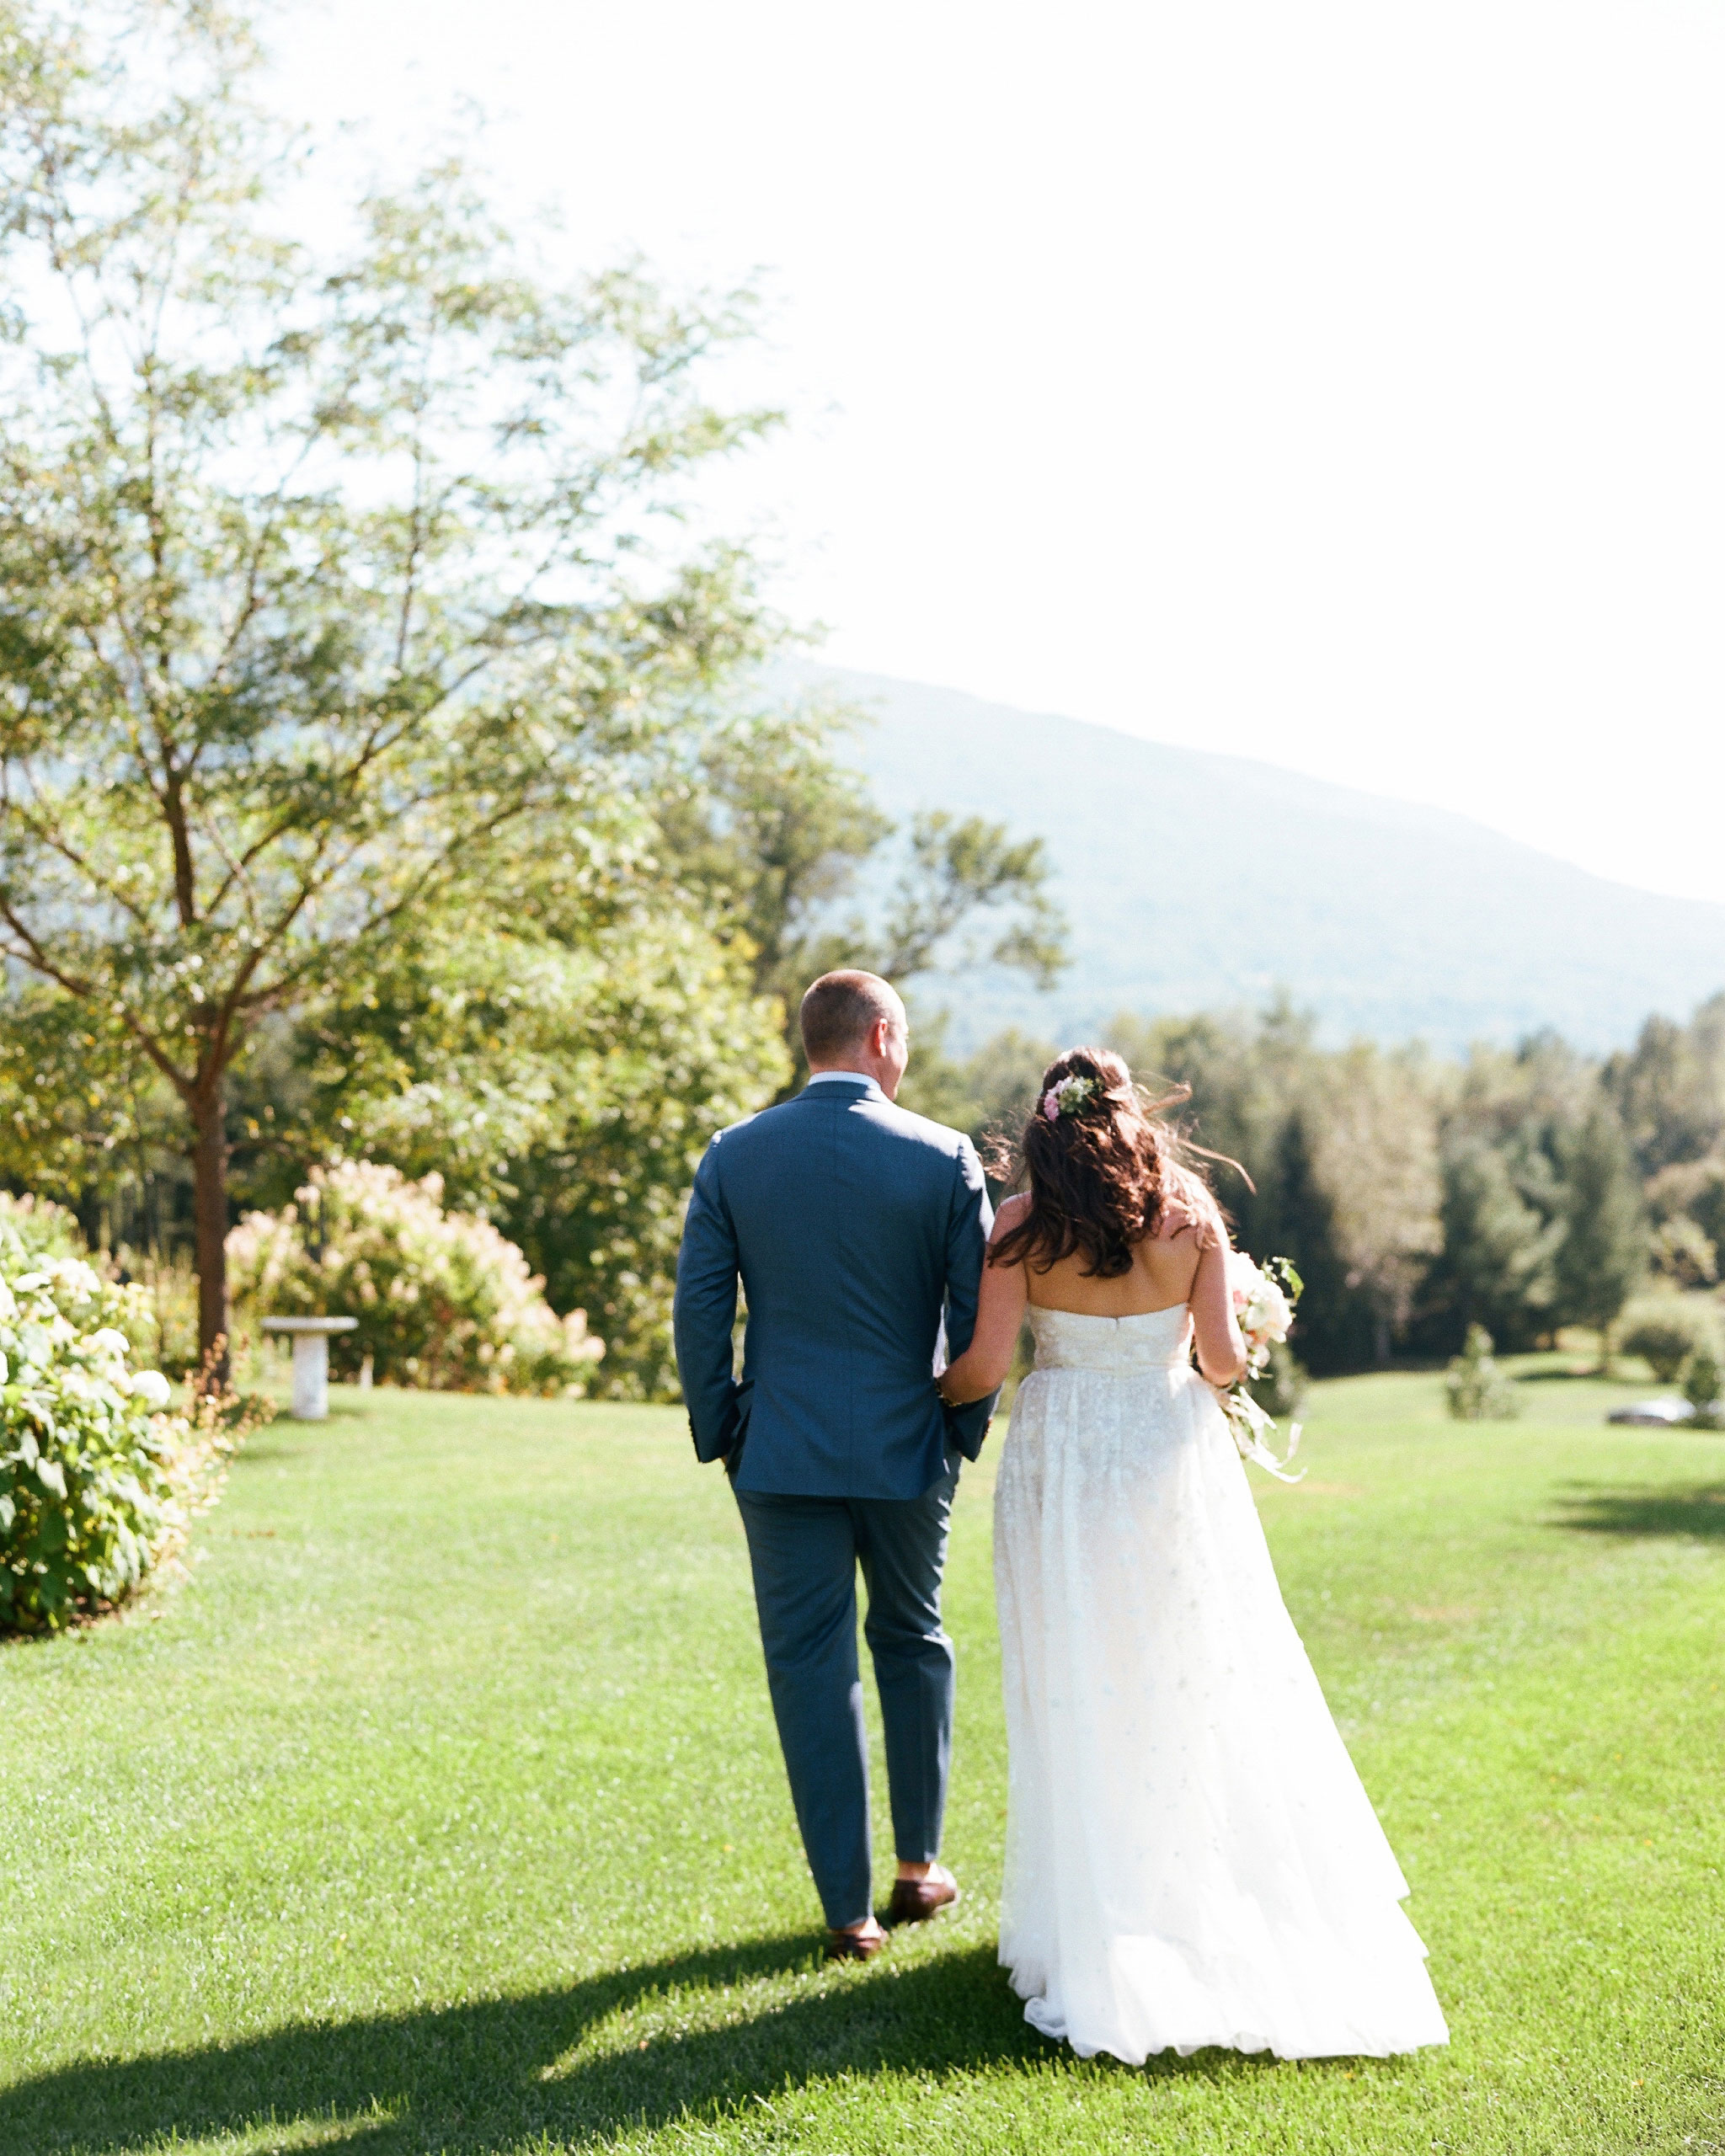 fiona-peter-wedding-couple-965601r-d112512.jpg